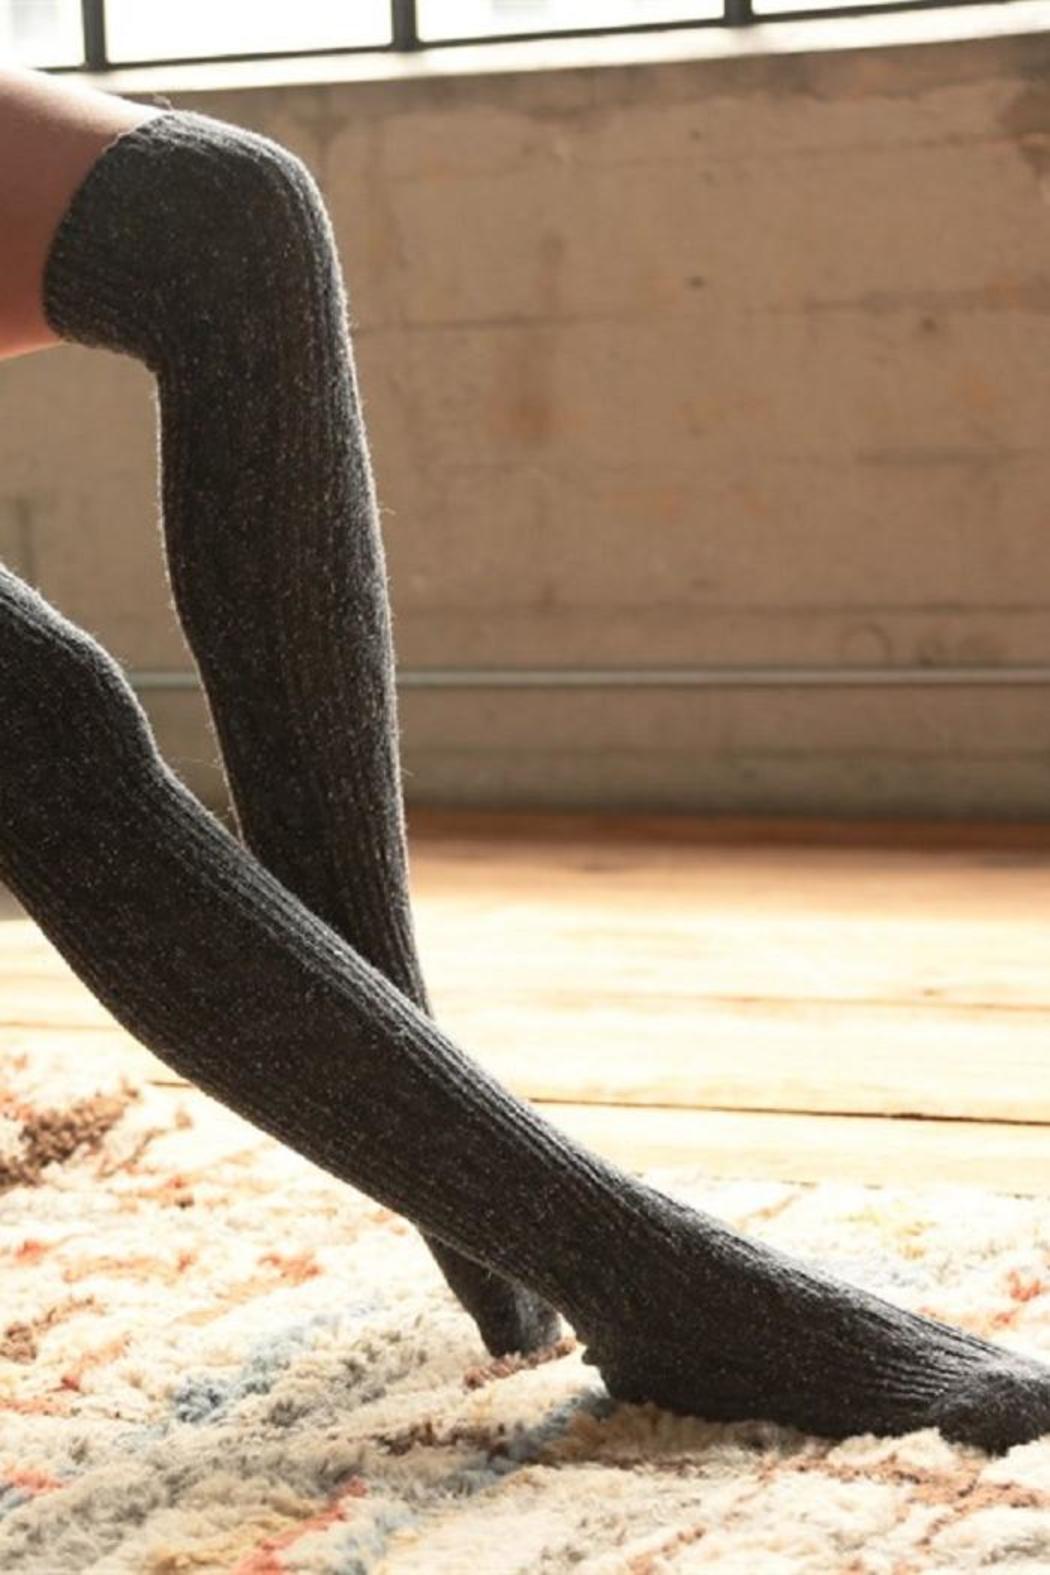 Apartminty Fresh Picks: Warm and Fuzzy | Urbanista Cable Knit Socks